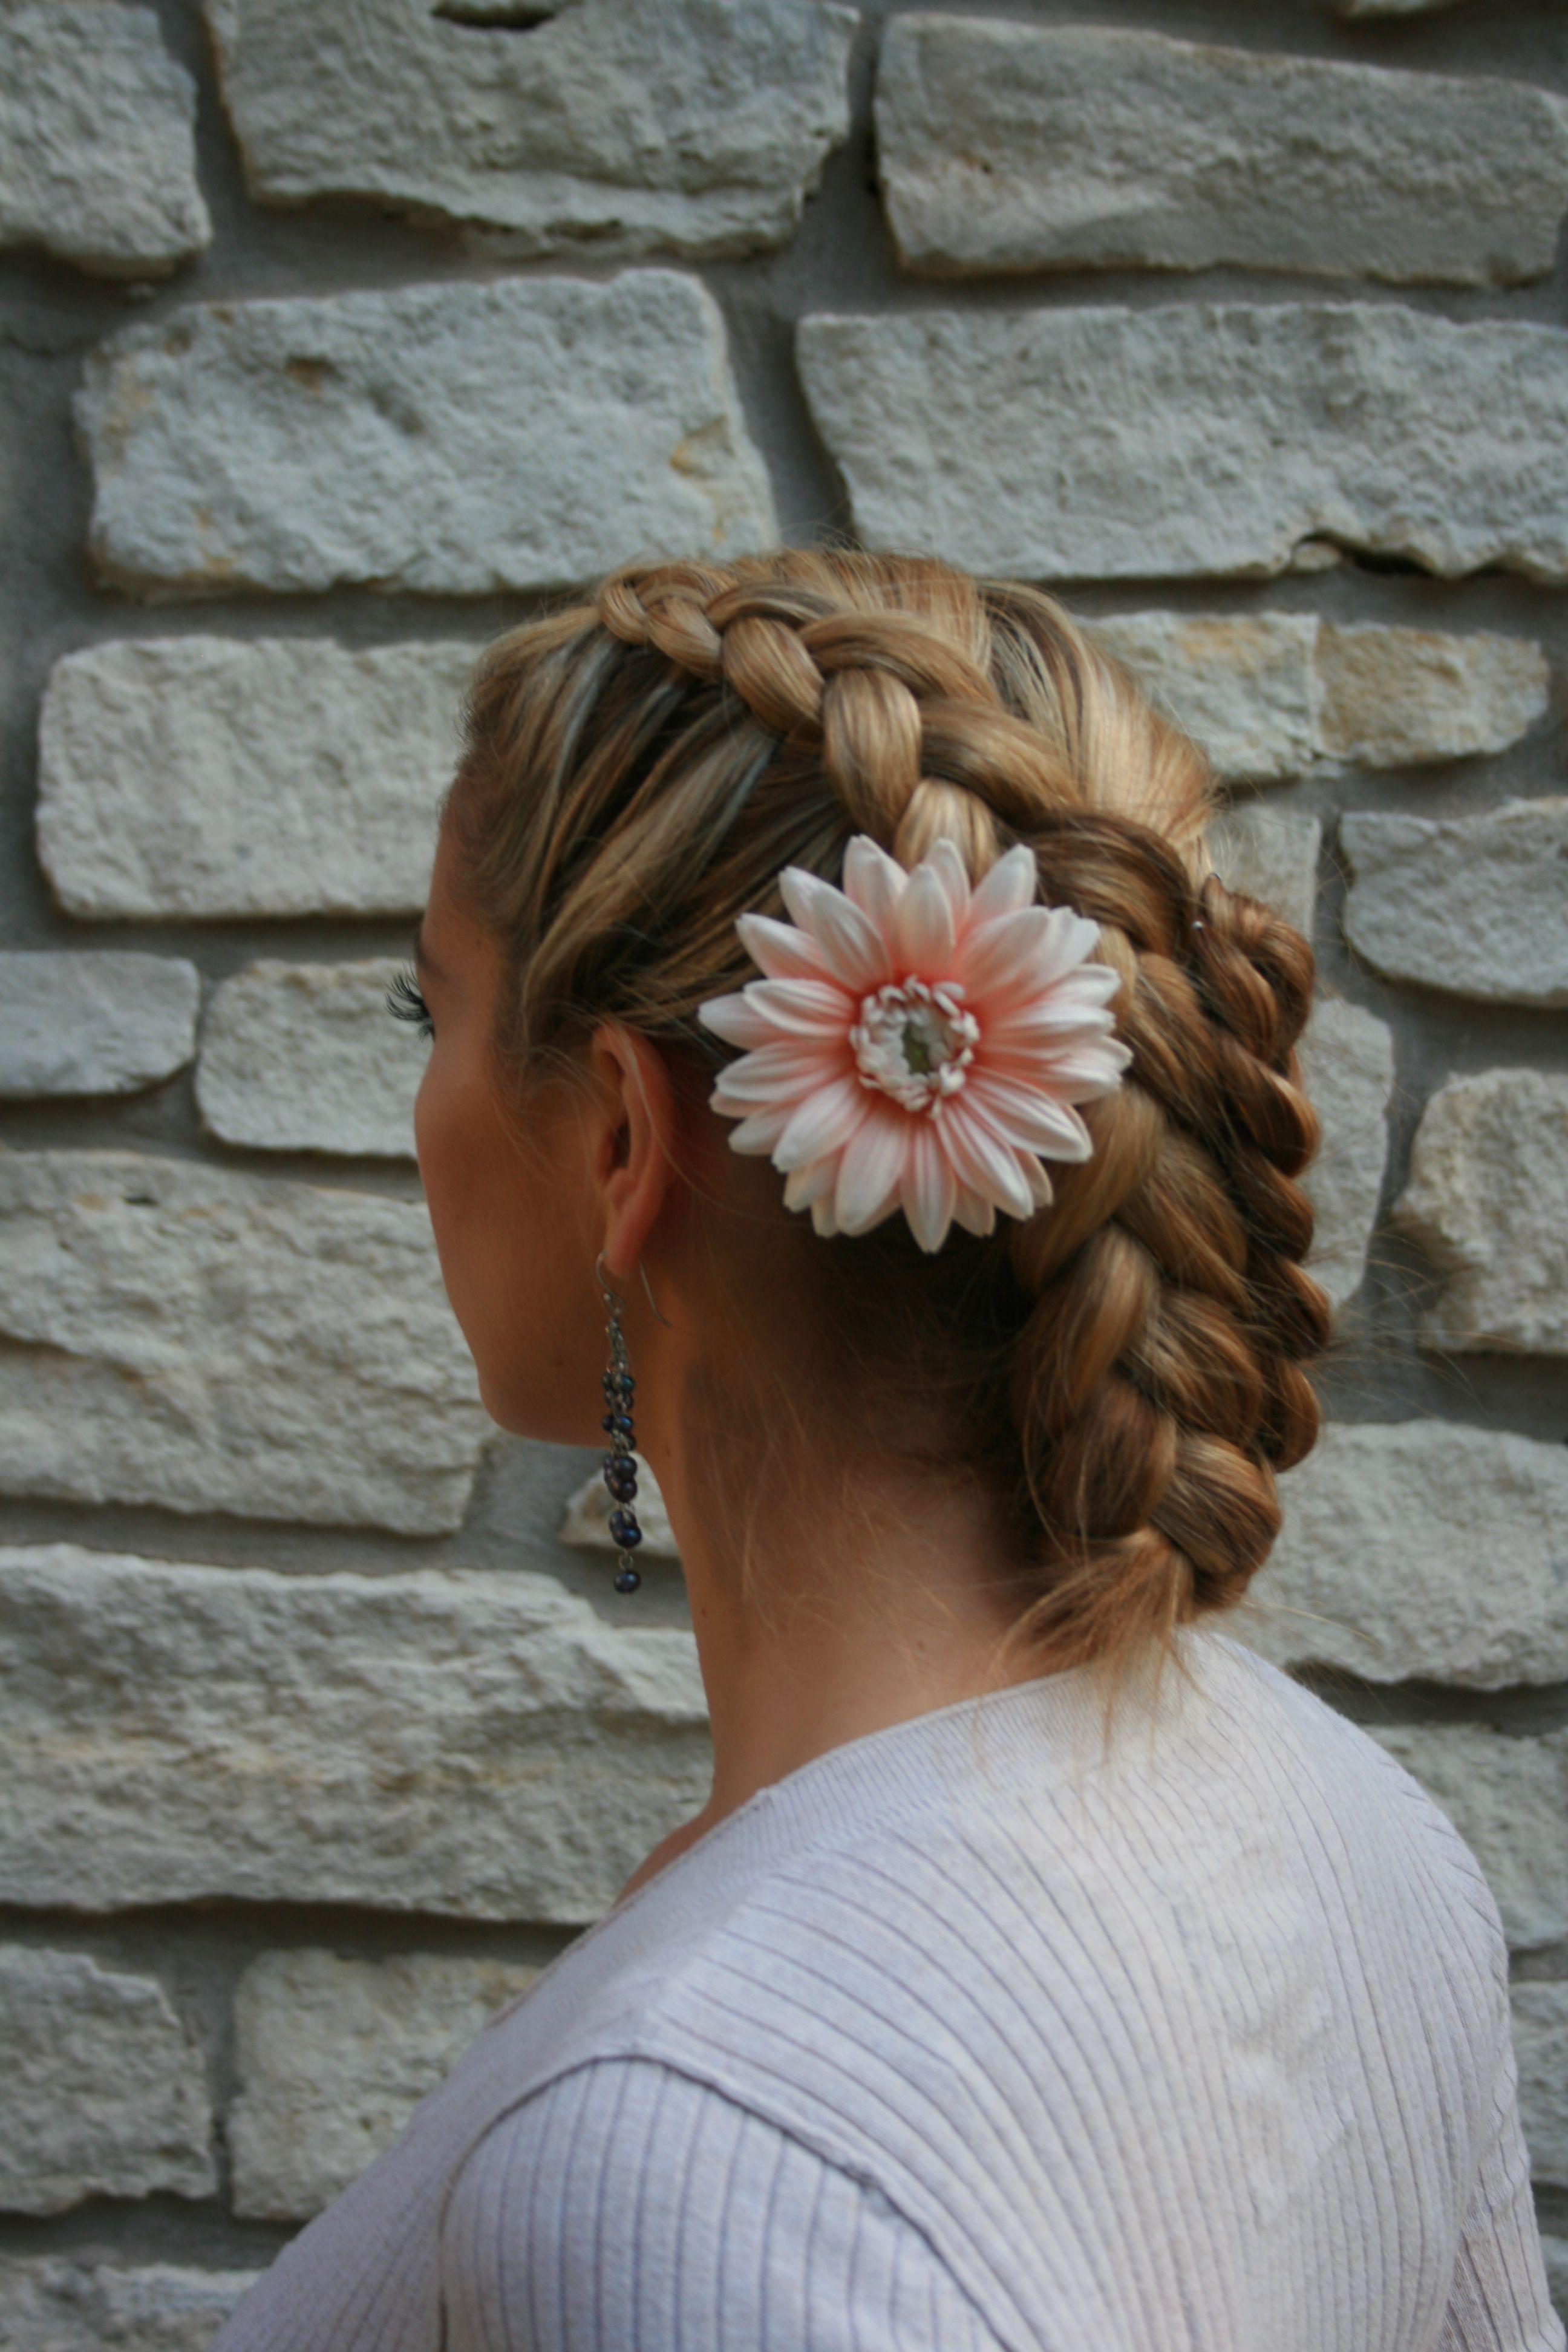 Austin Wedding Hair And Makeup Wedding Hair And Makeup Wedding Makeup Style Hair And Beauty Salon